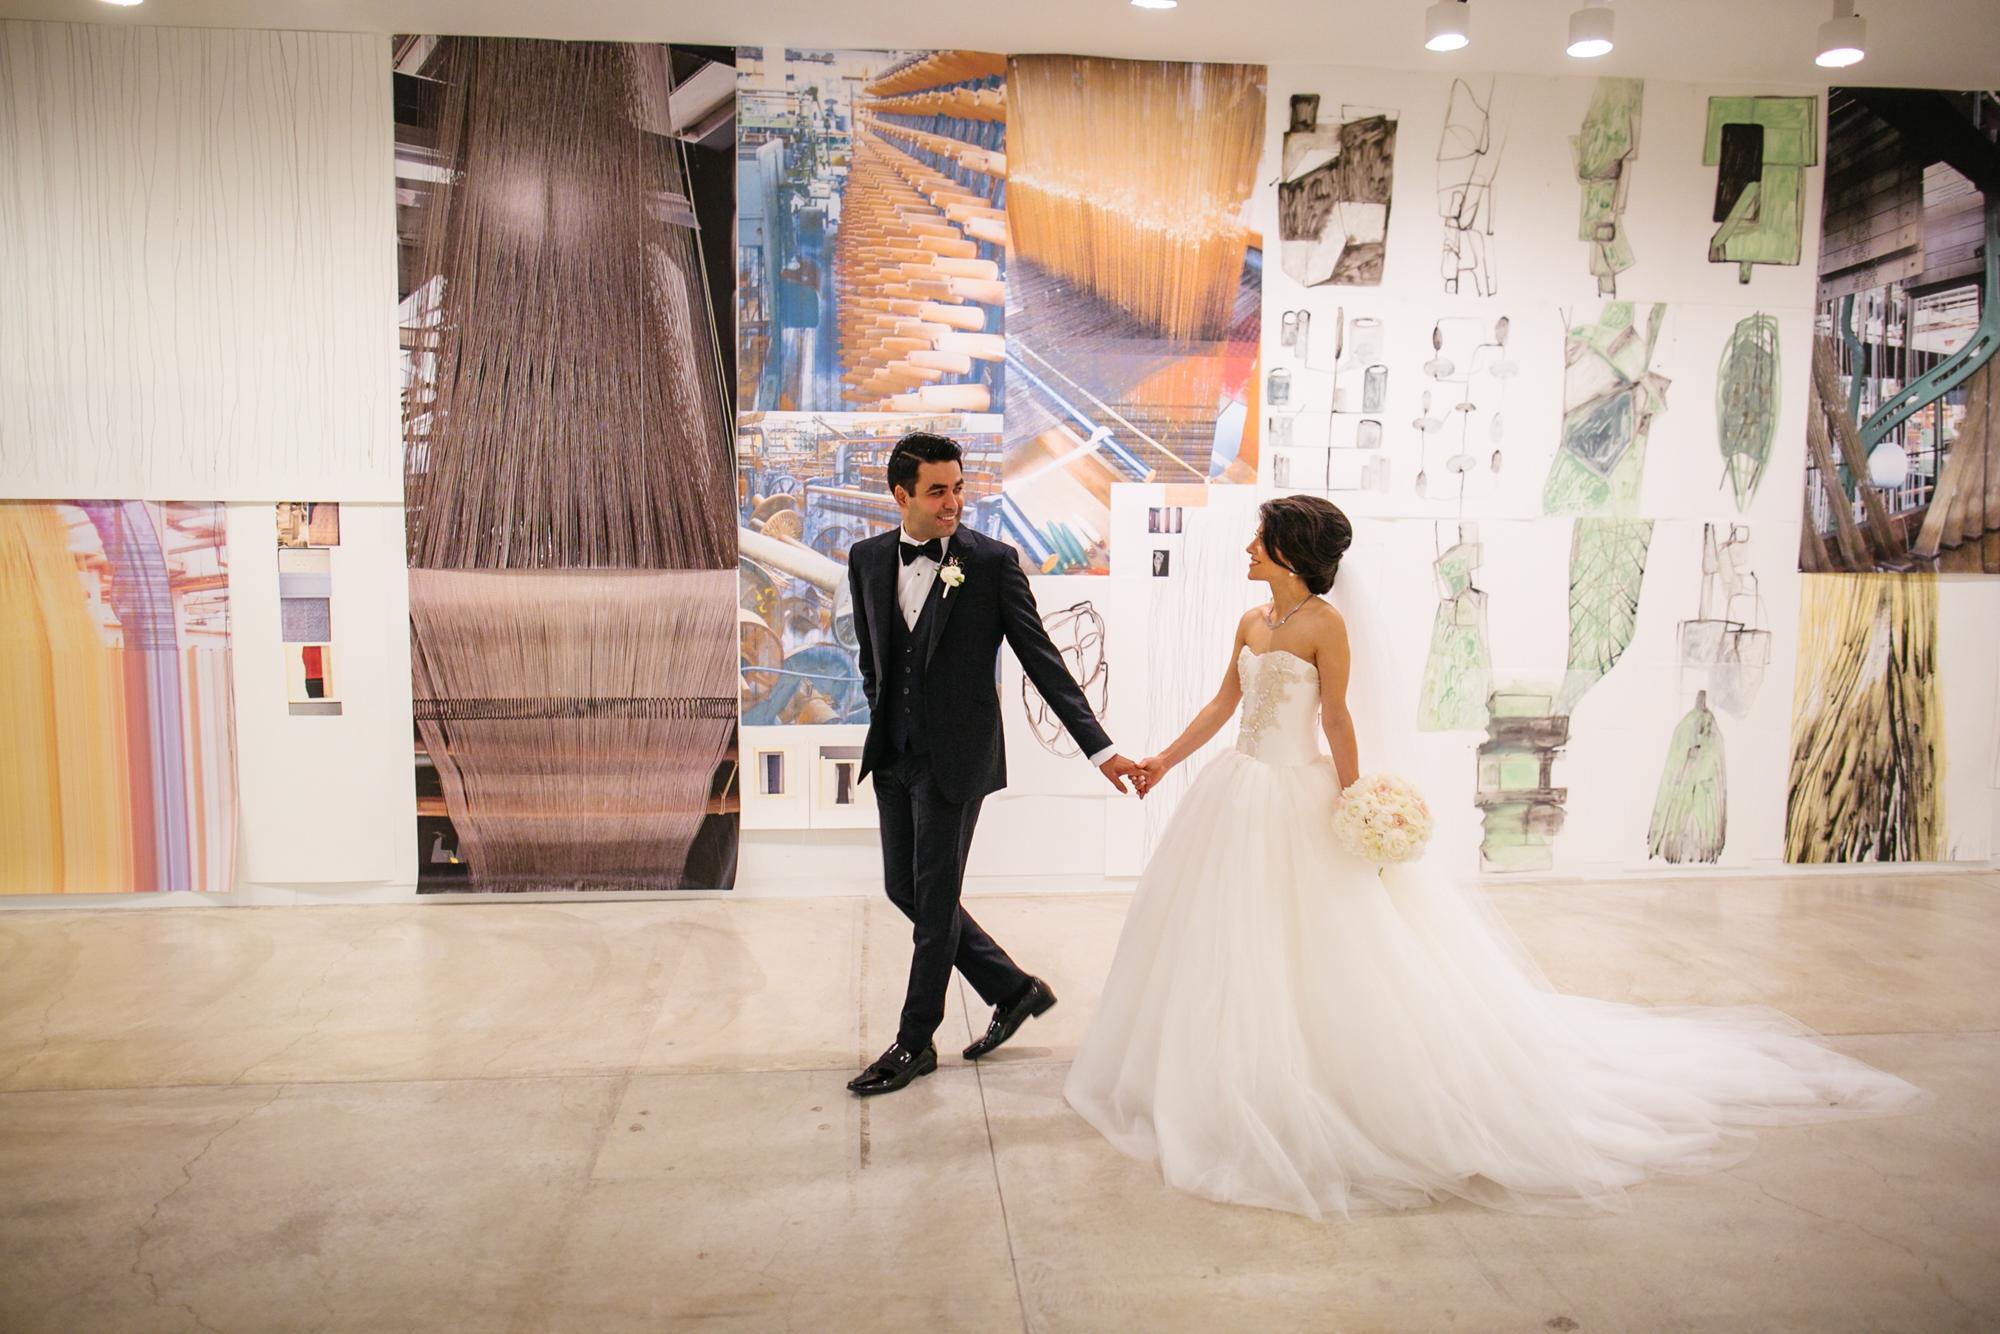 vancouver-luxury-wedding-photographer-lori-miles-0461.jpg